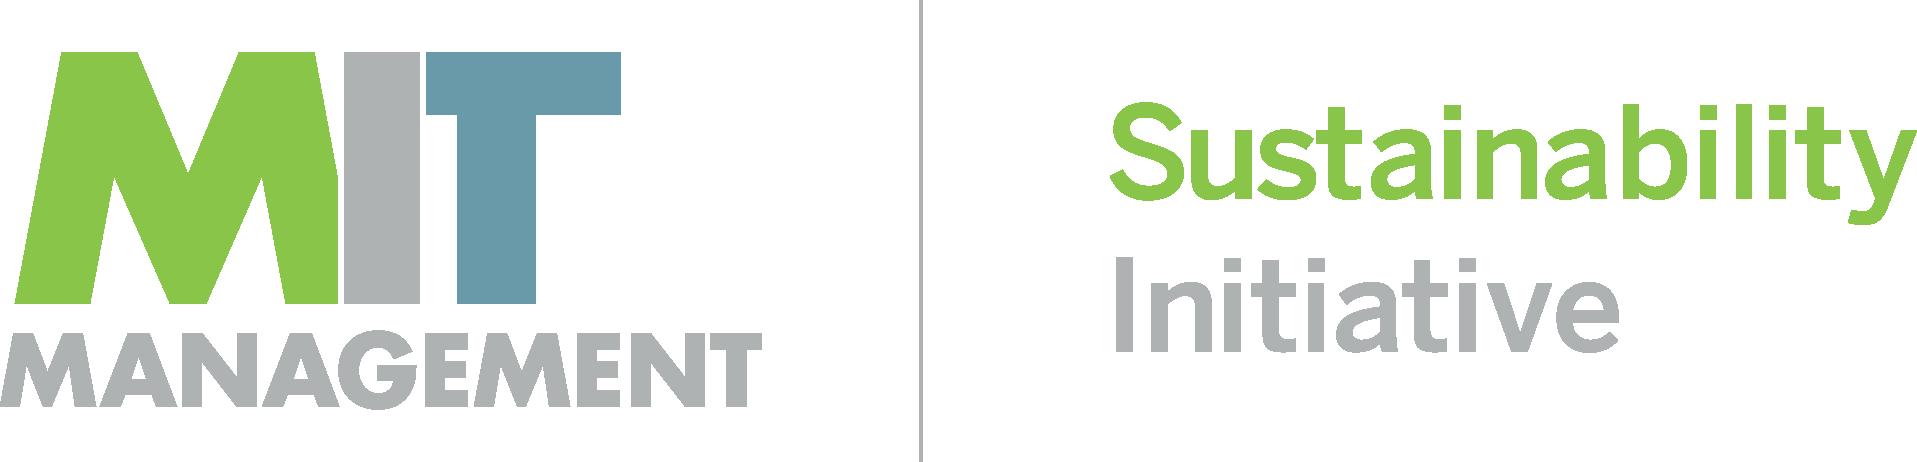 MIT+SI_RGB_green_grey_blue_horizontal.png